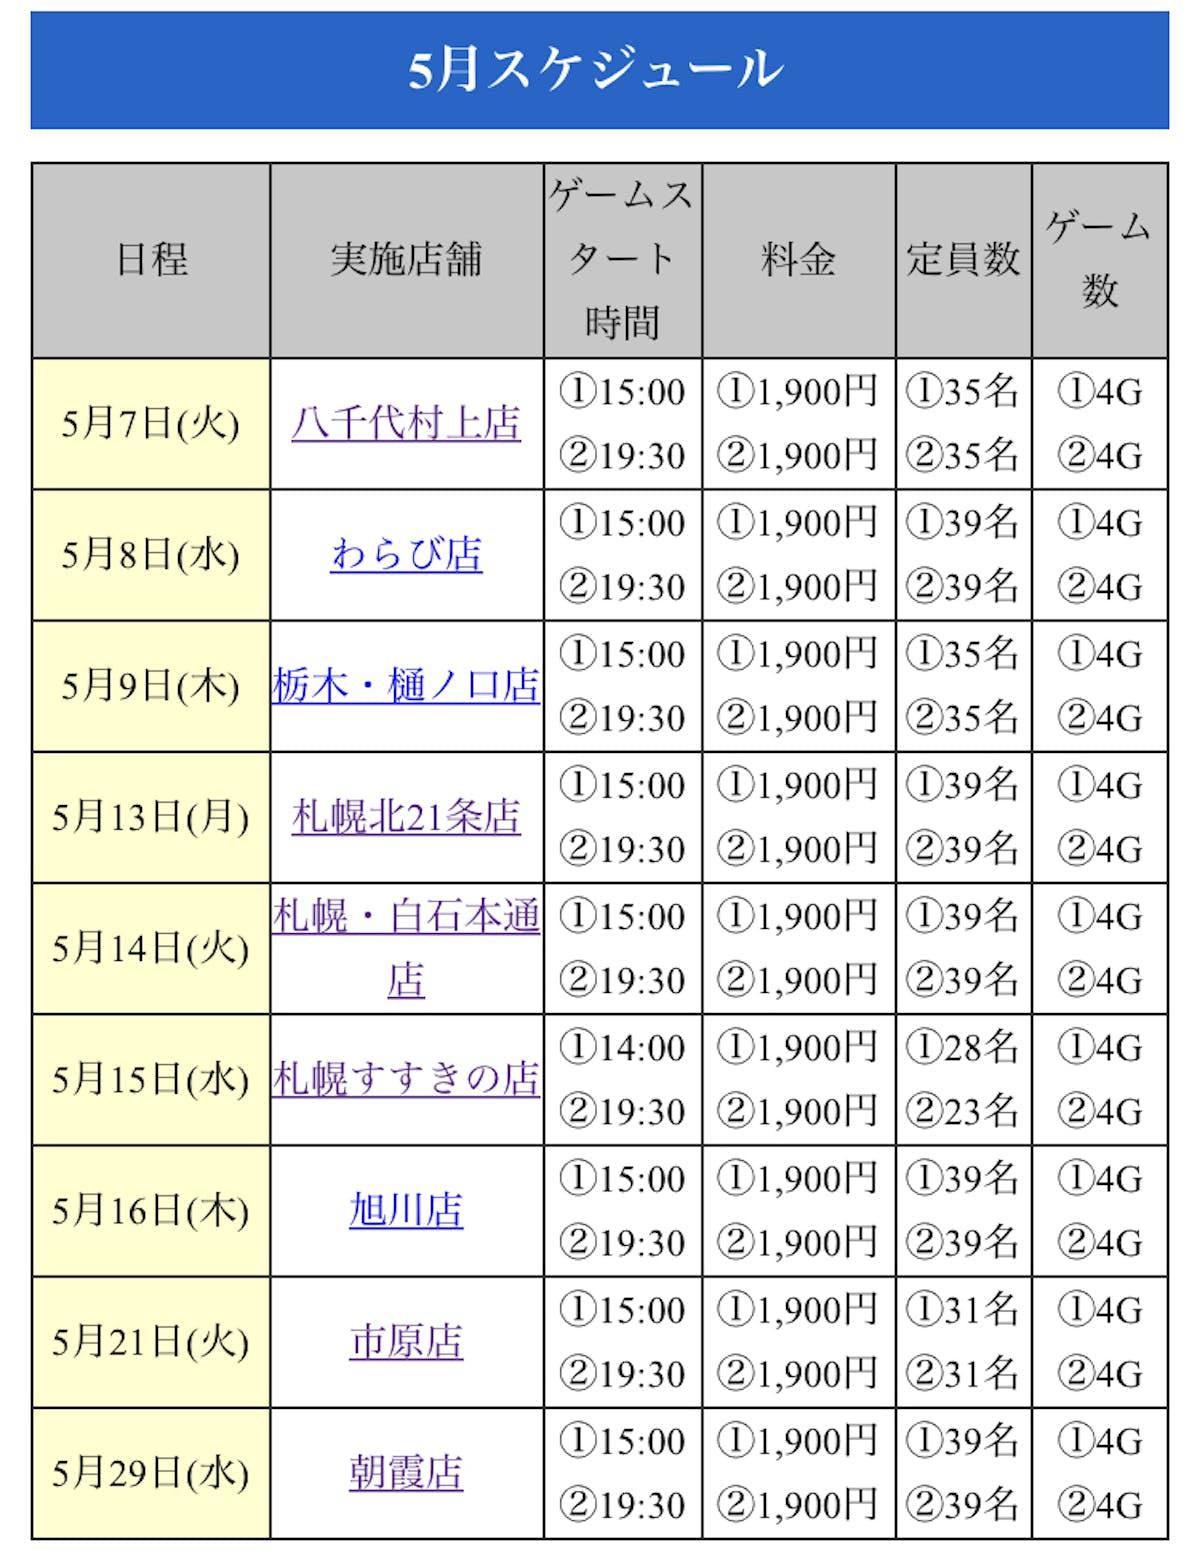 E01426FF-B733-4B31-99D5-7C376812F815.jpeg